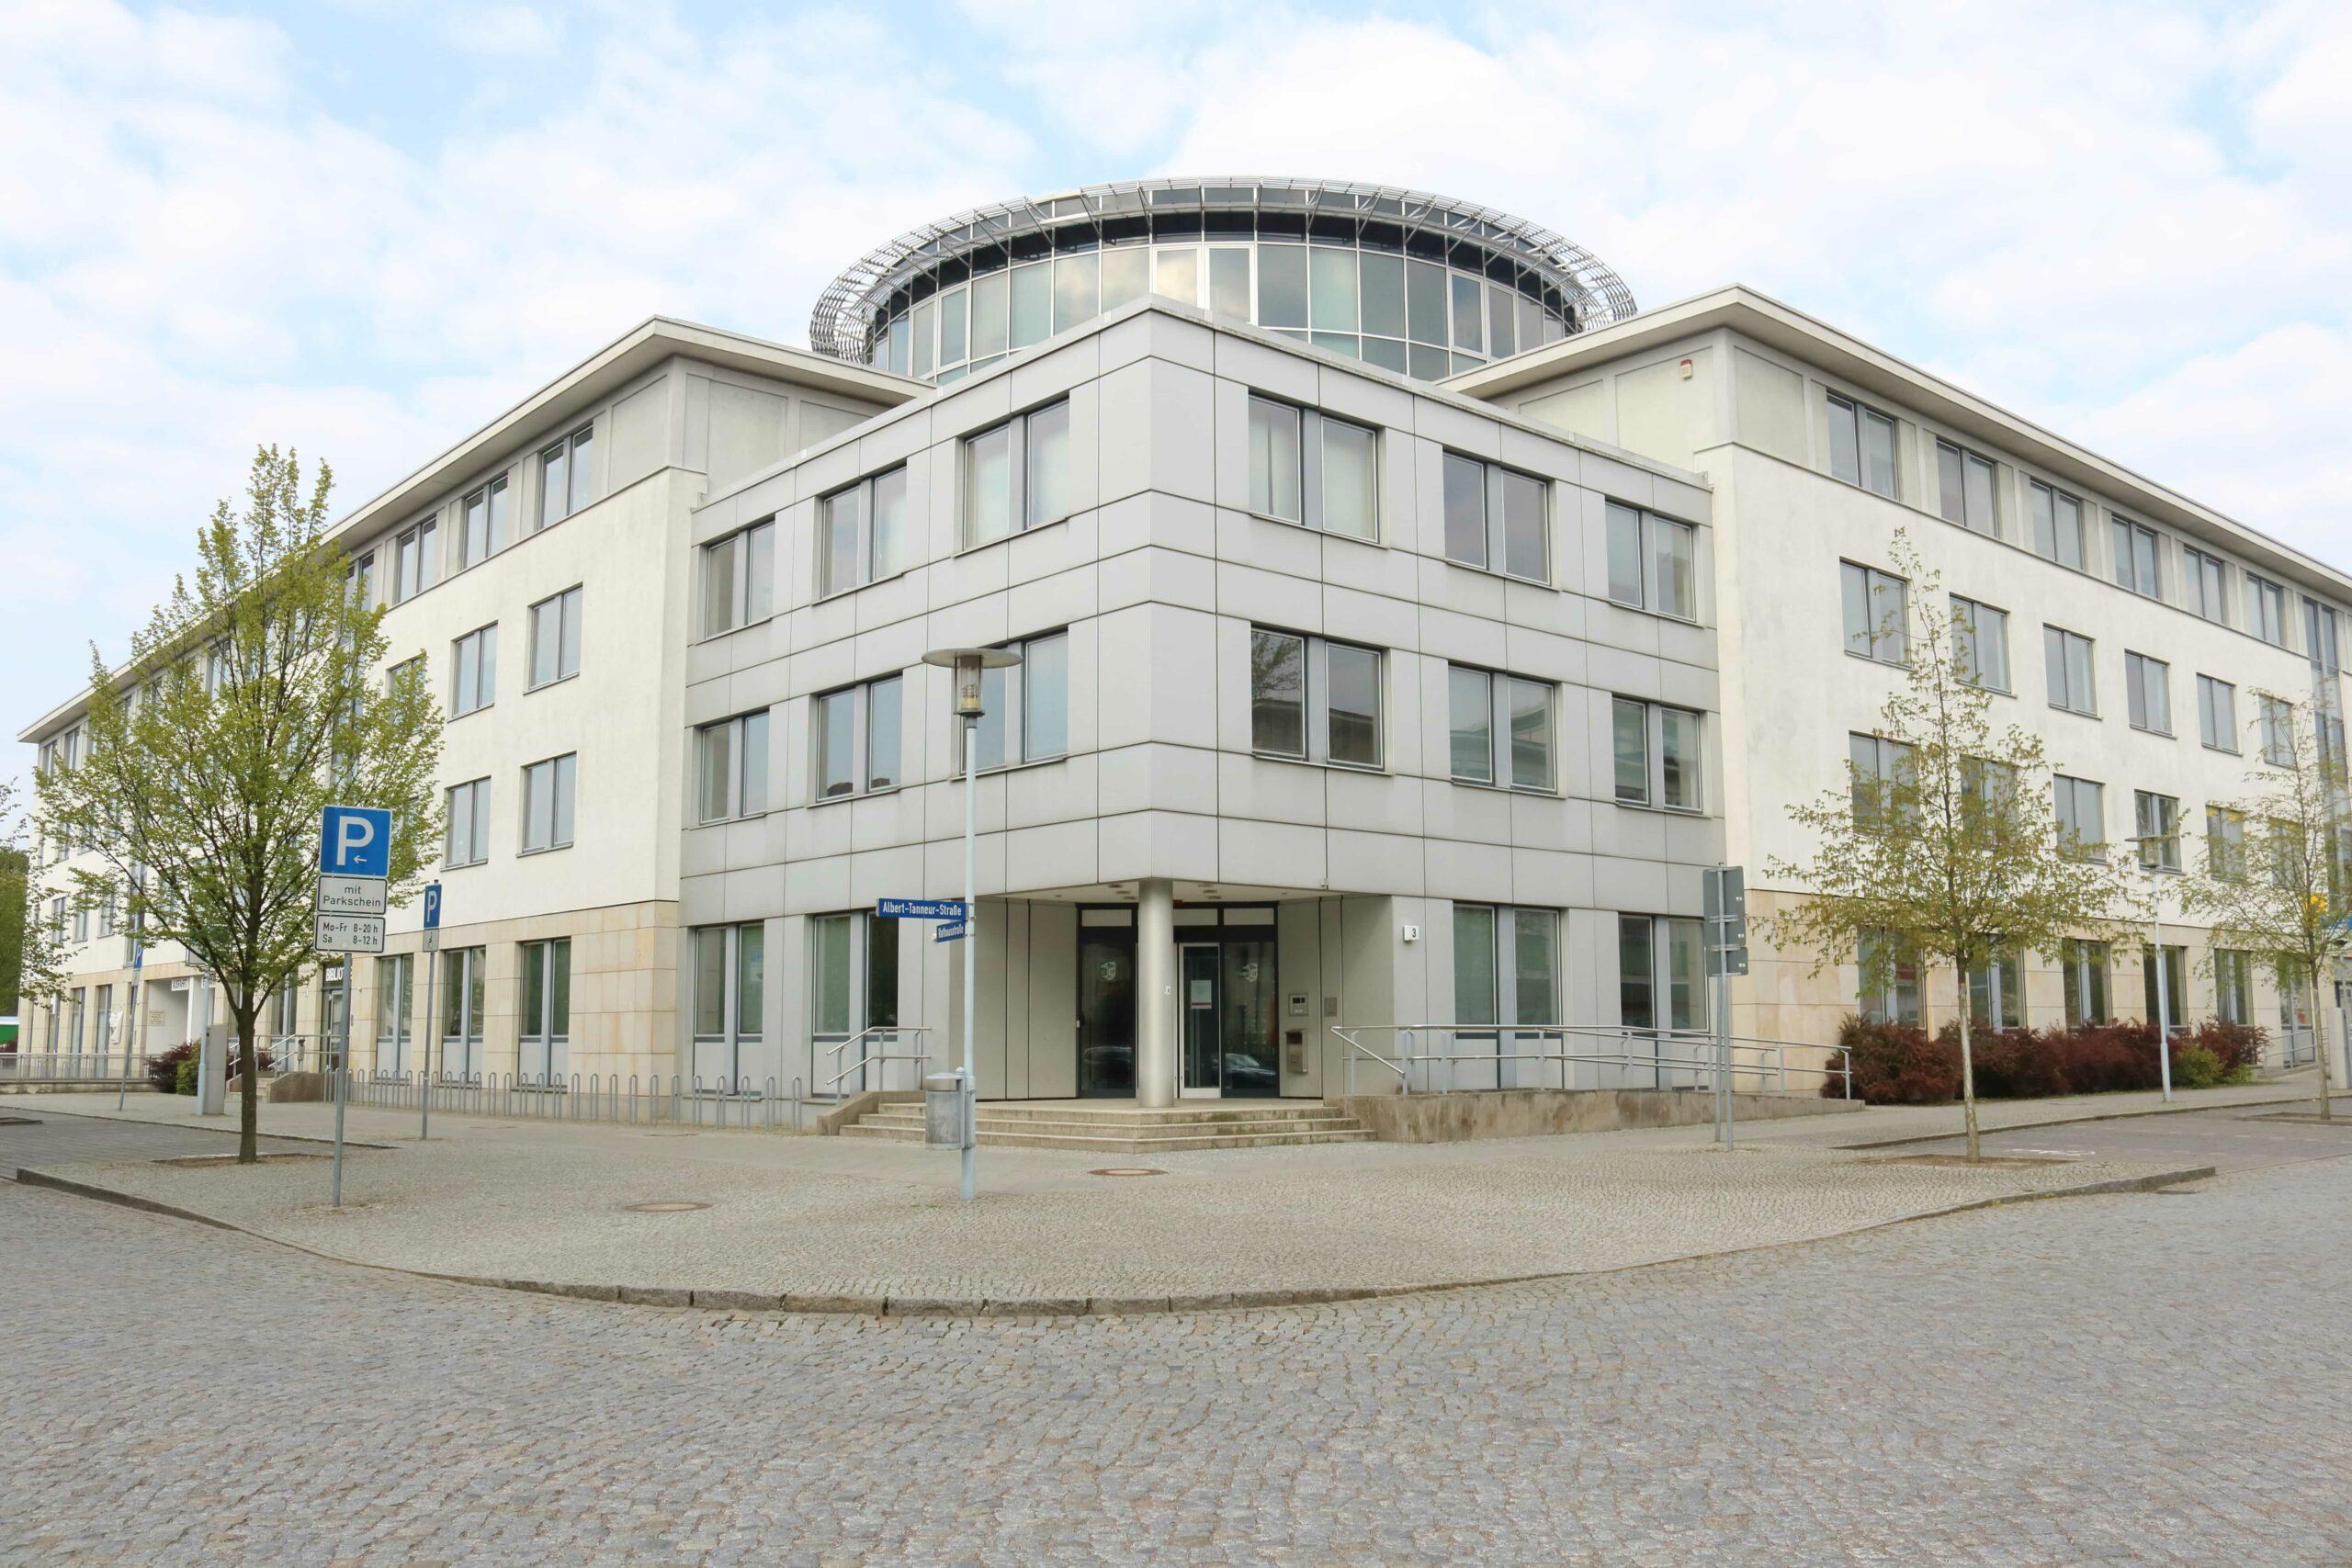 Bürgeramt Ludwigsfelde